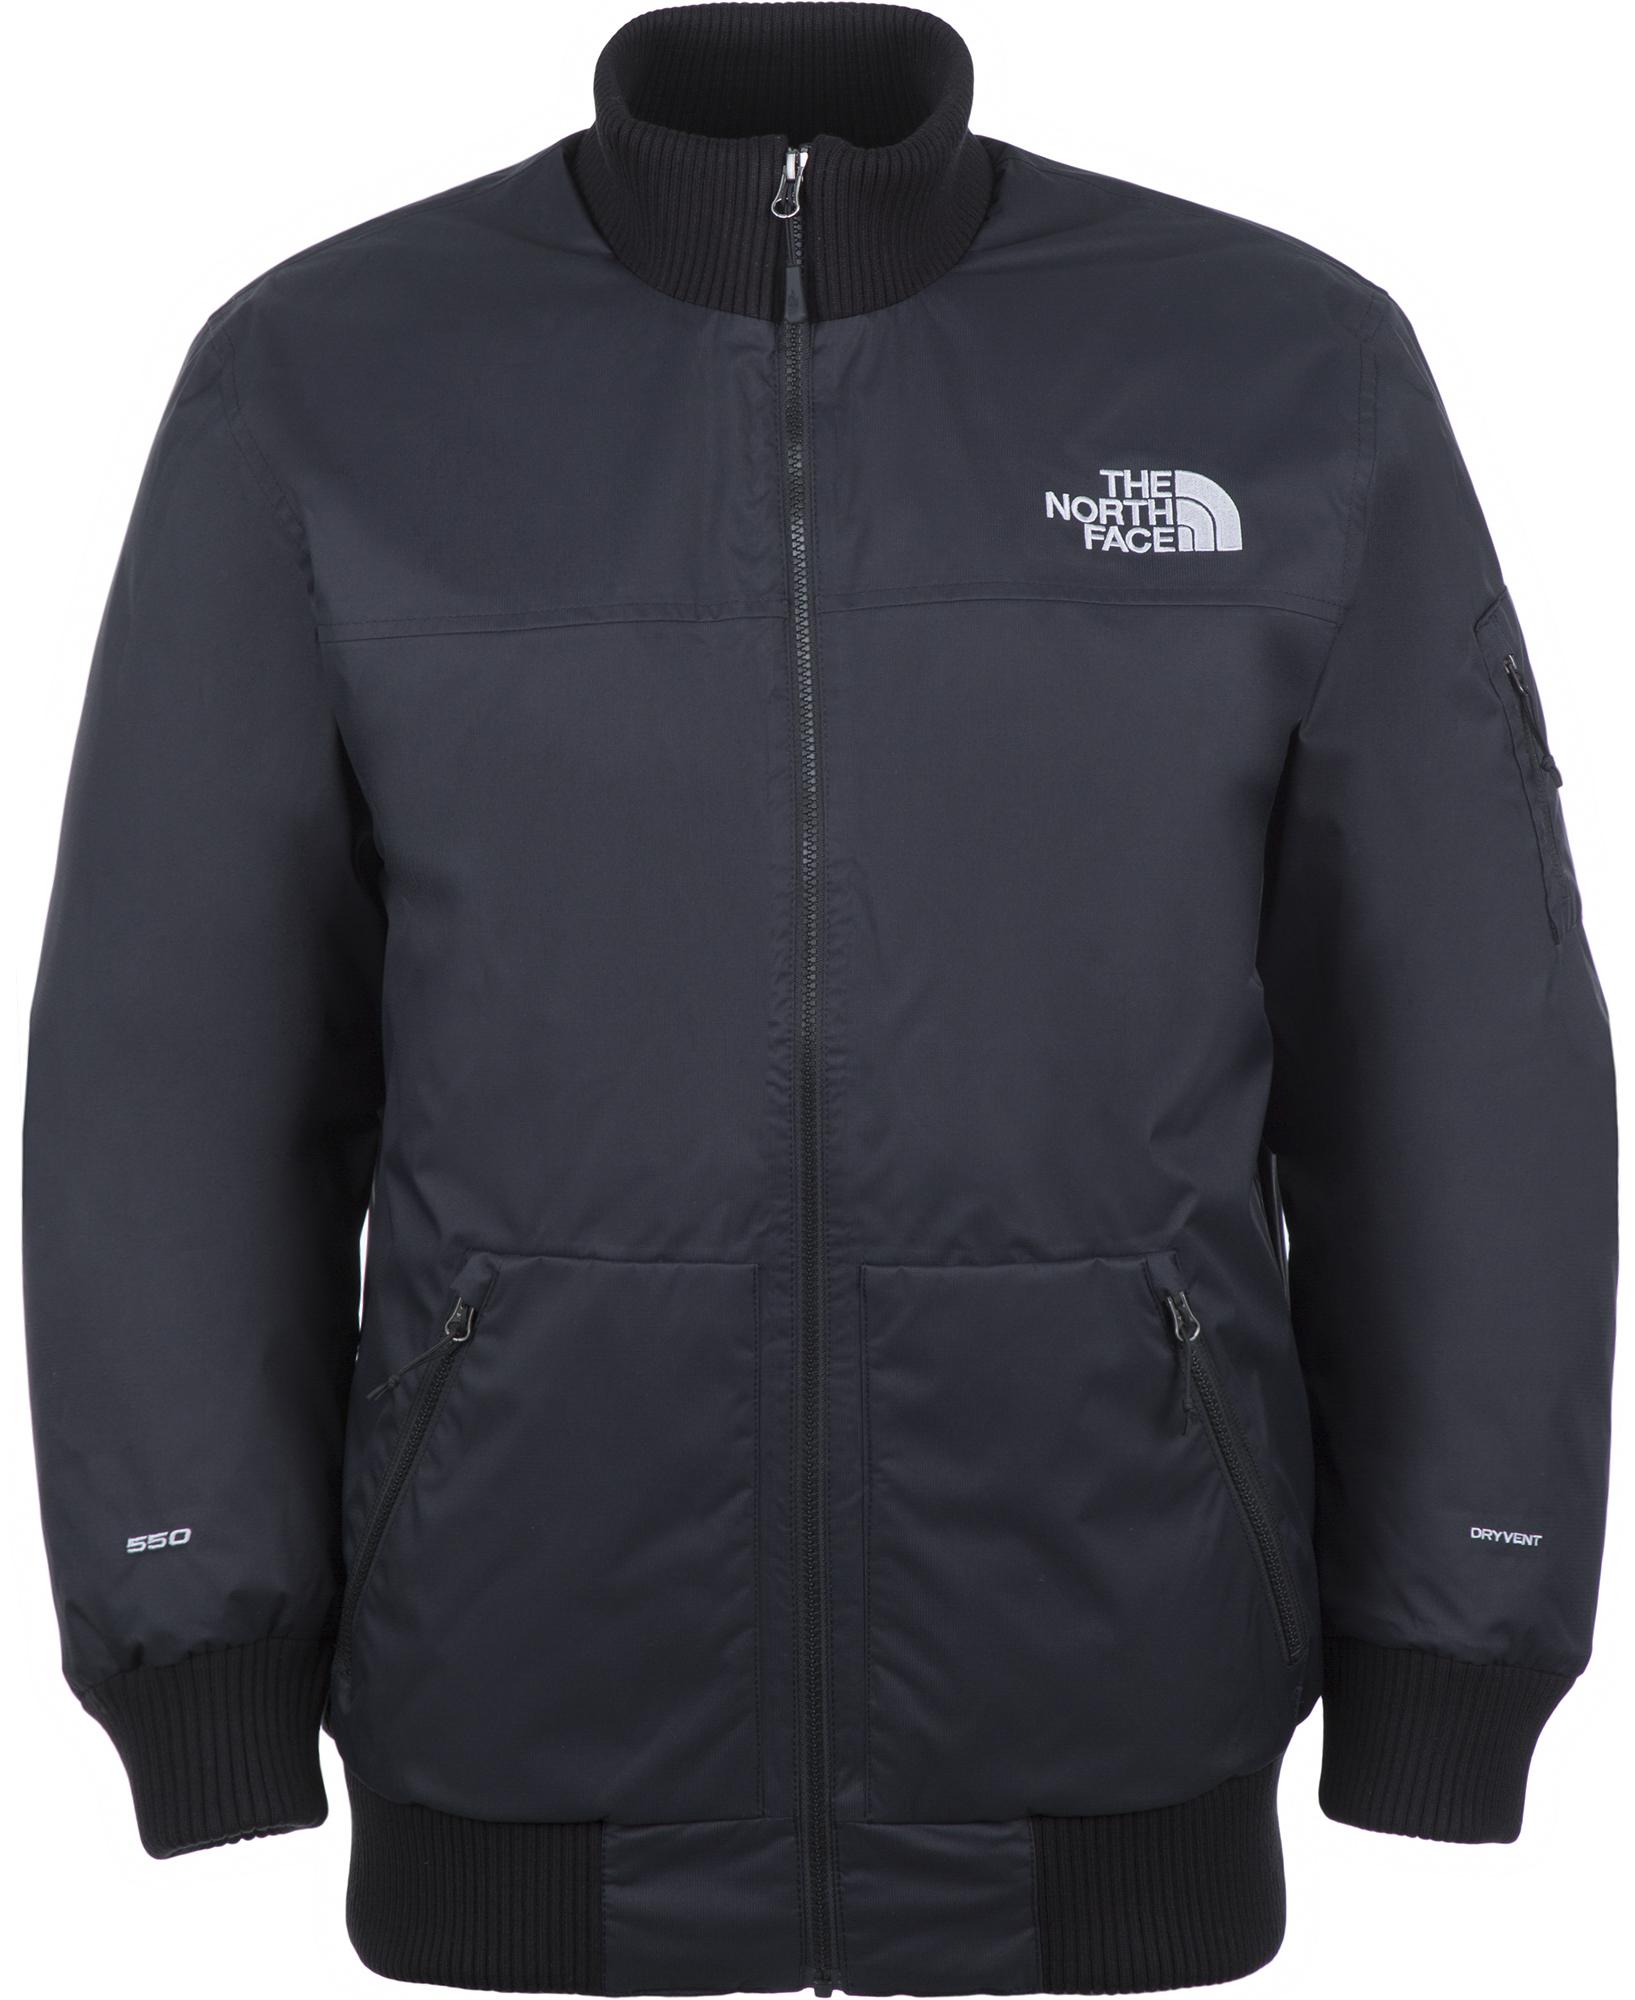 The North Face Куртка пуховая мужская The North Face Dubano, размер 50